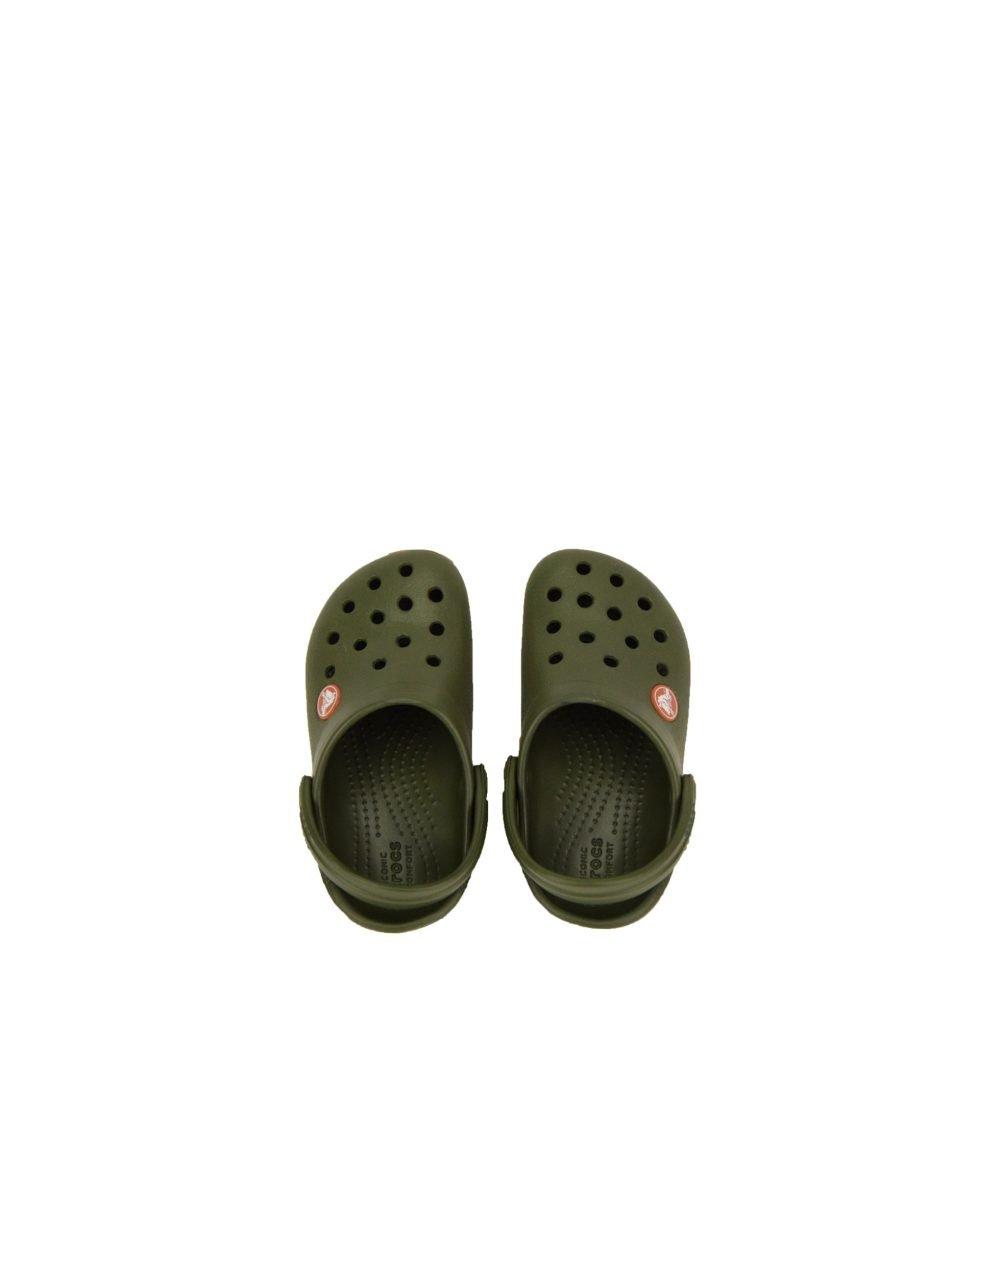 Crocs Crocband Clog Kids (204537-3TB) Army Green/Burnt Sienna